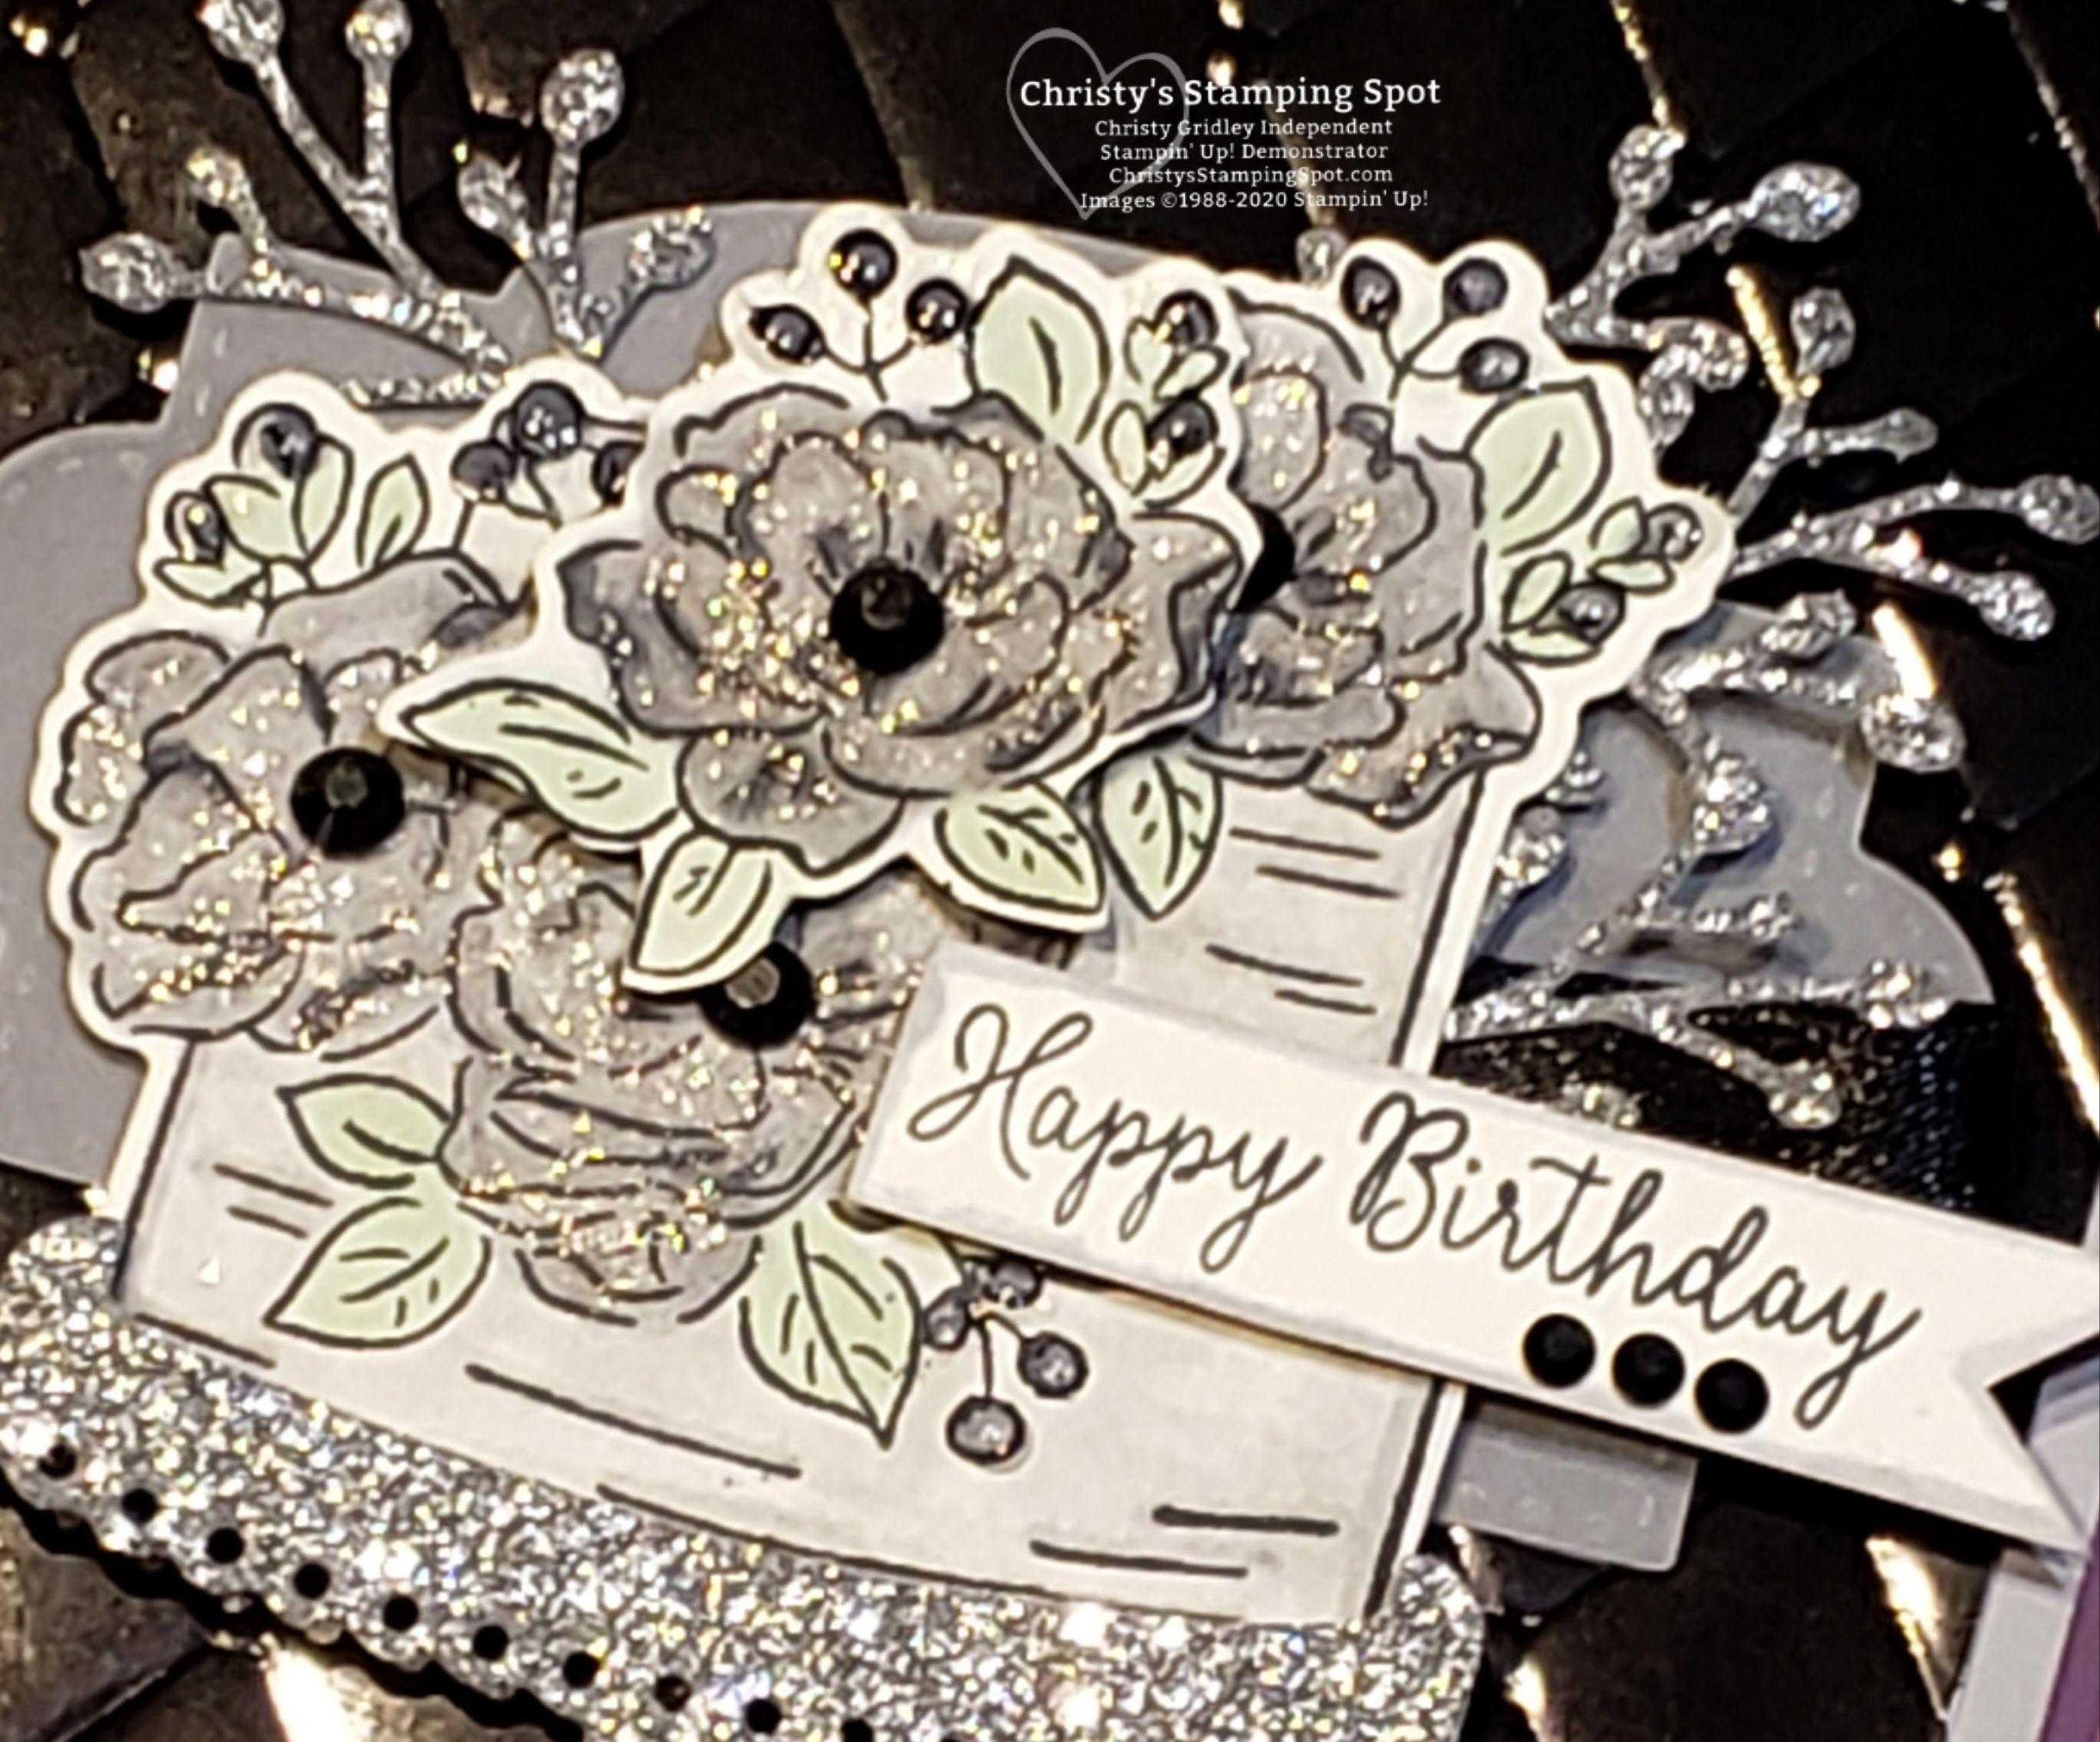 Touch Of Gothic Birthday Card Happy Birthday Daughter Birthday Cards Birthday Wishes For Daughter